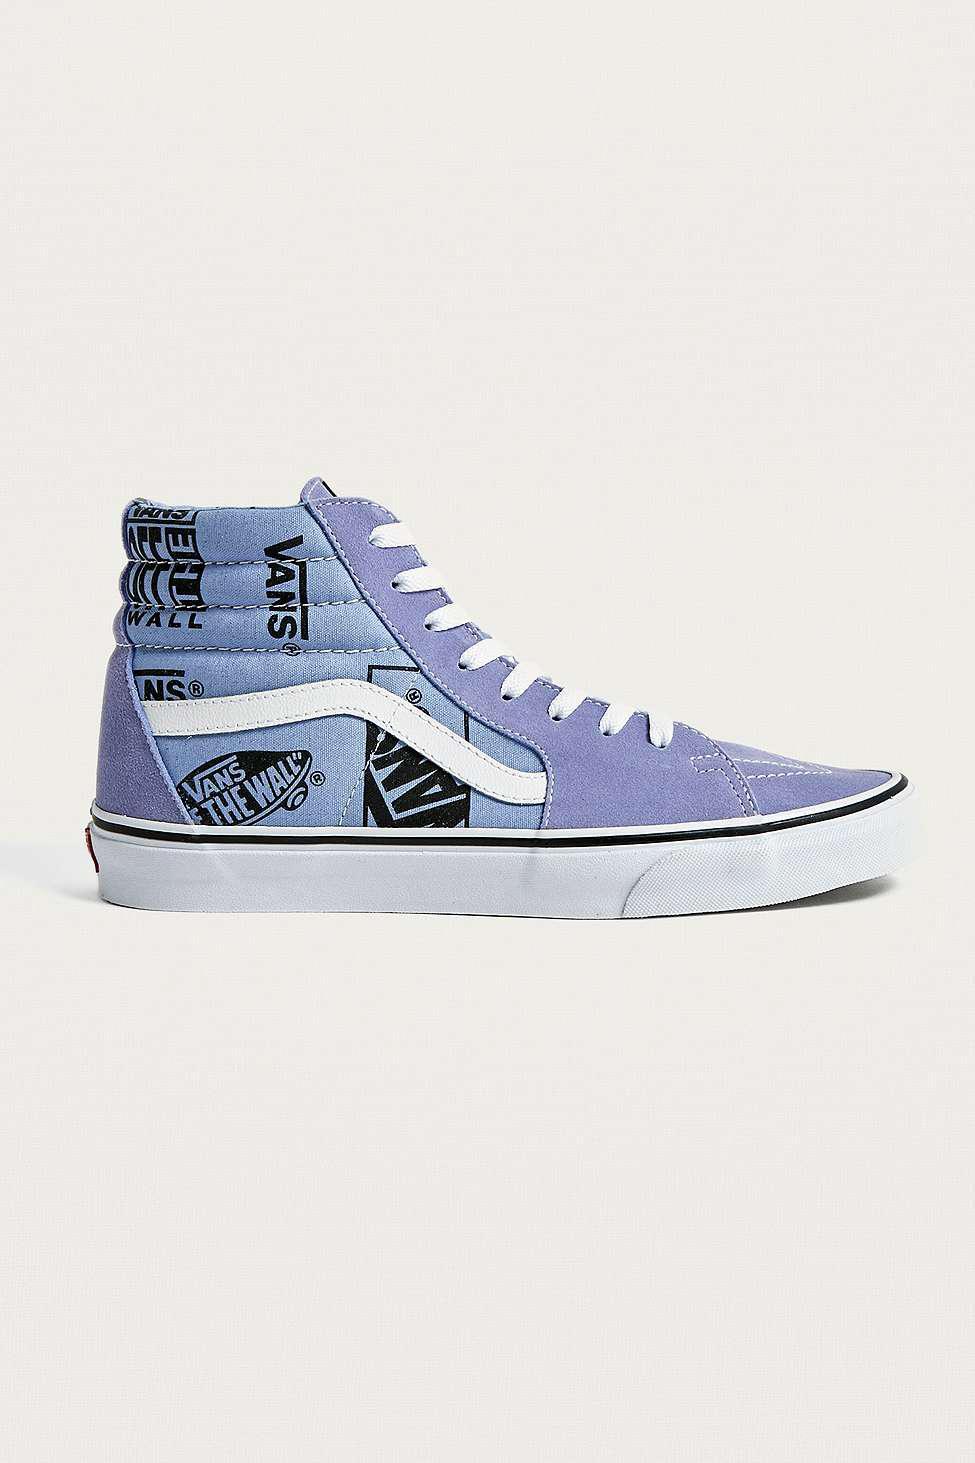 34521b278a Vans logo mix hi lavender trainers mens uk in purple jpg 975x1463 Purple  vans logo